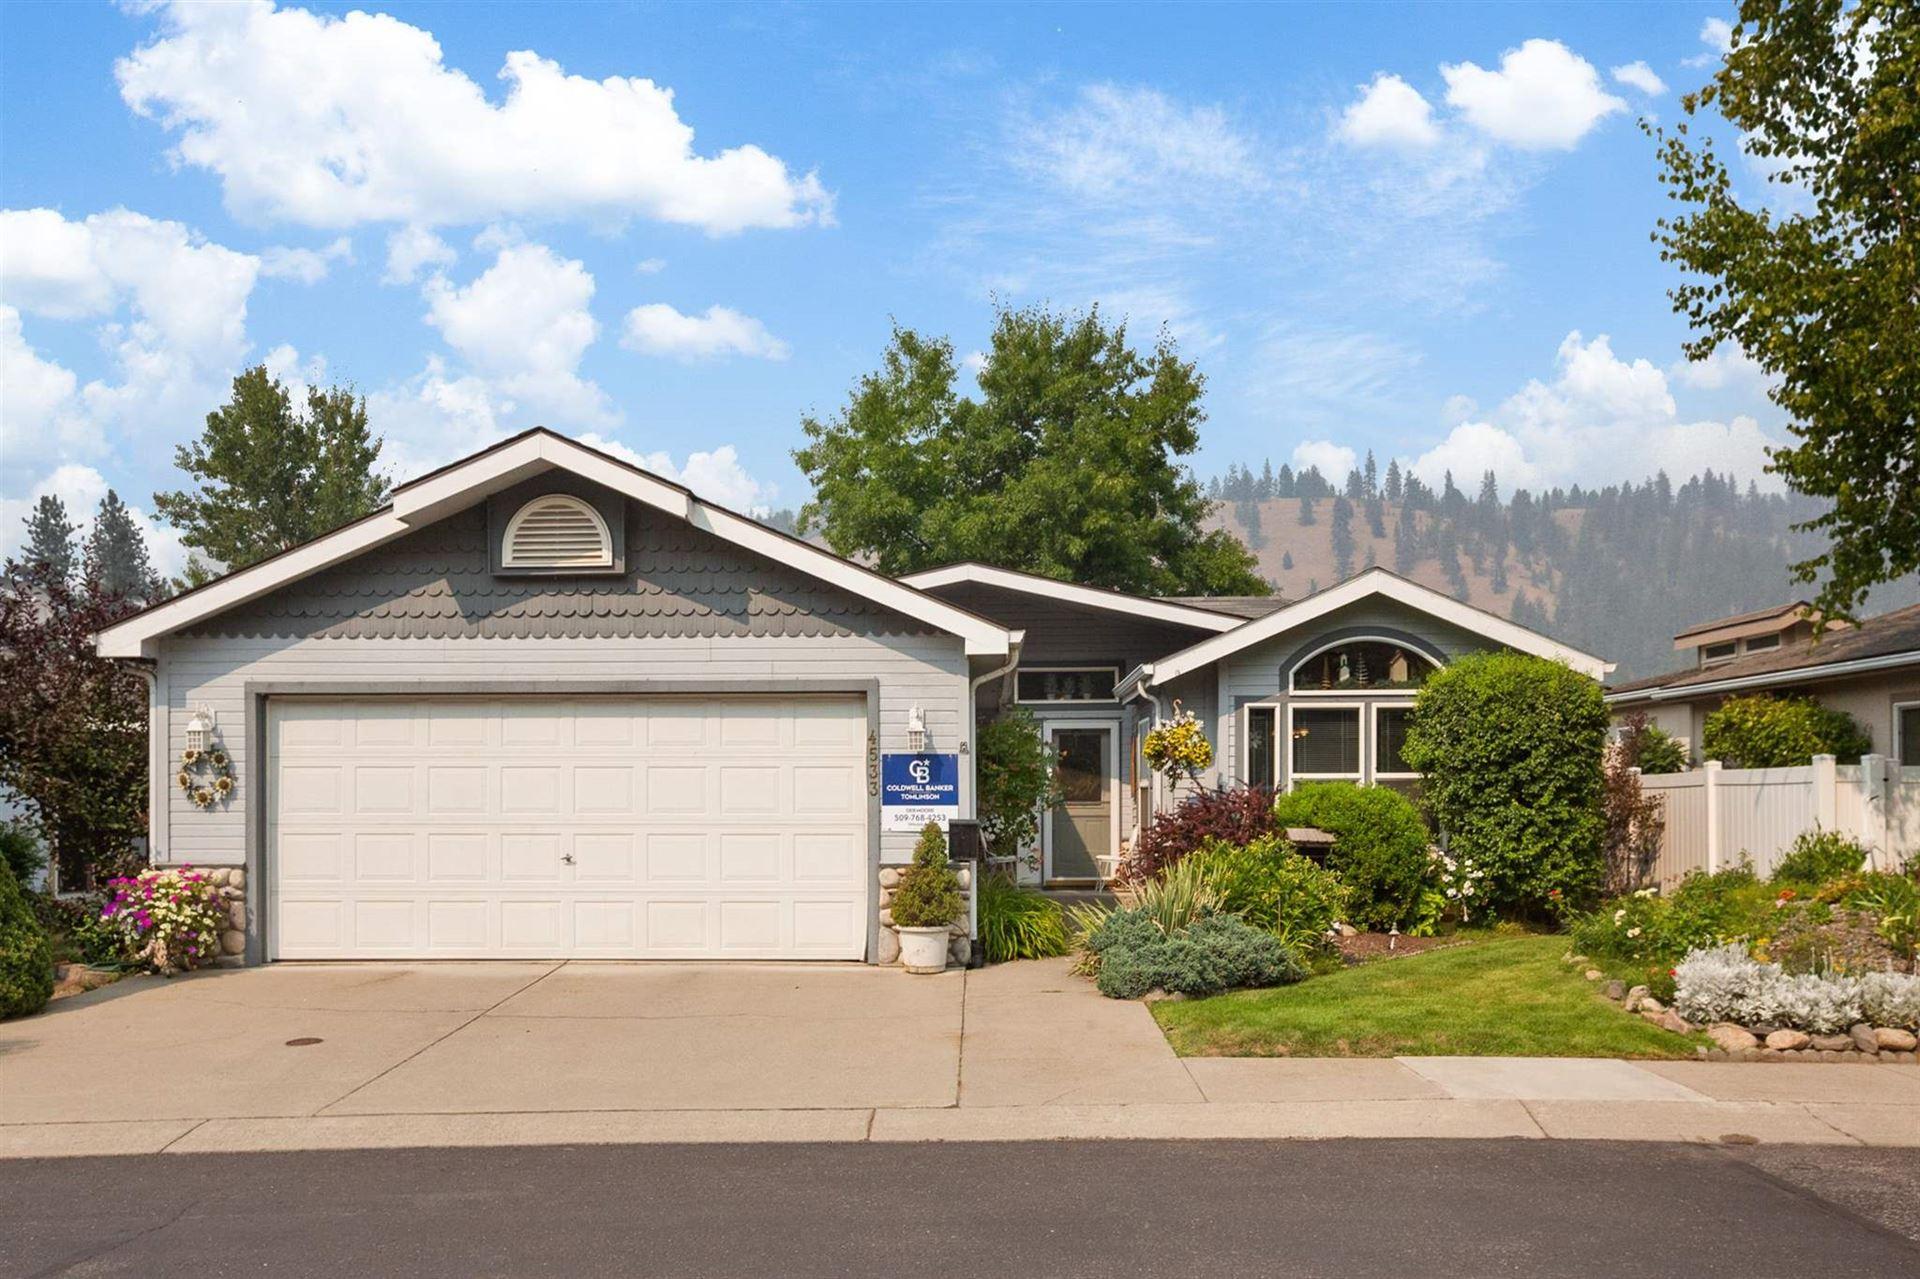 4533 S Sunny Creek Cir, Spokane, WA 99224 - #: 202120576